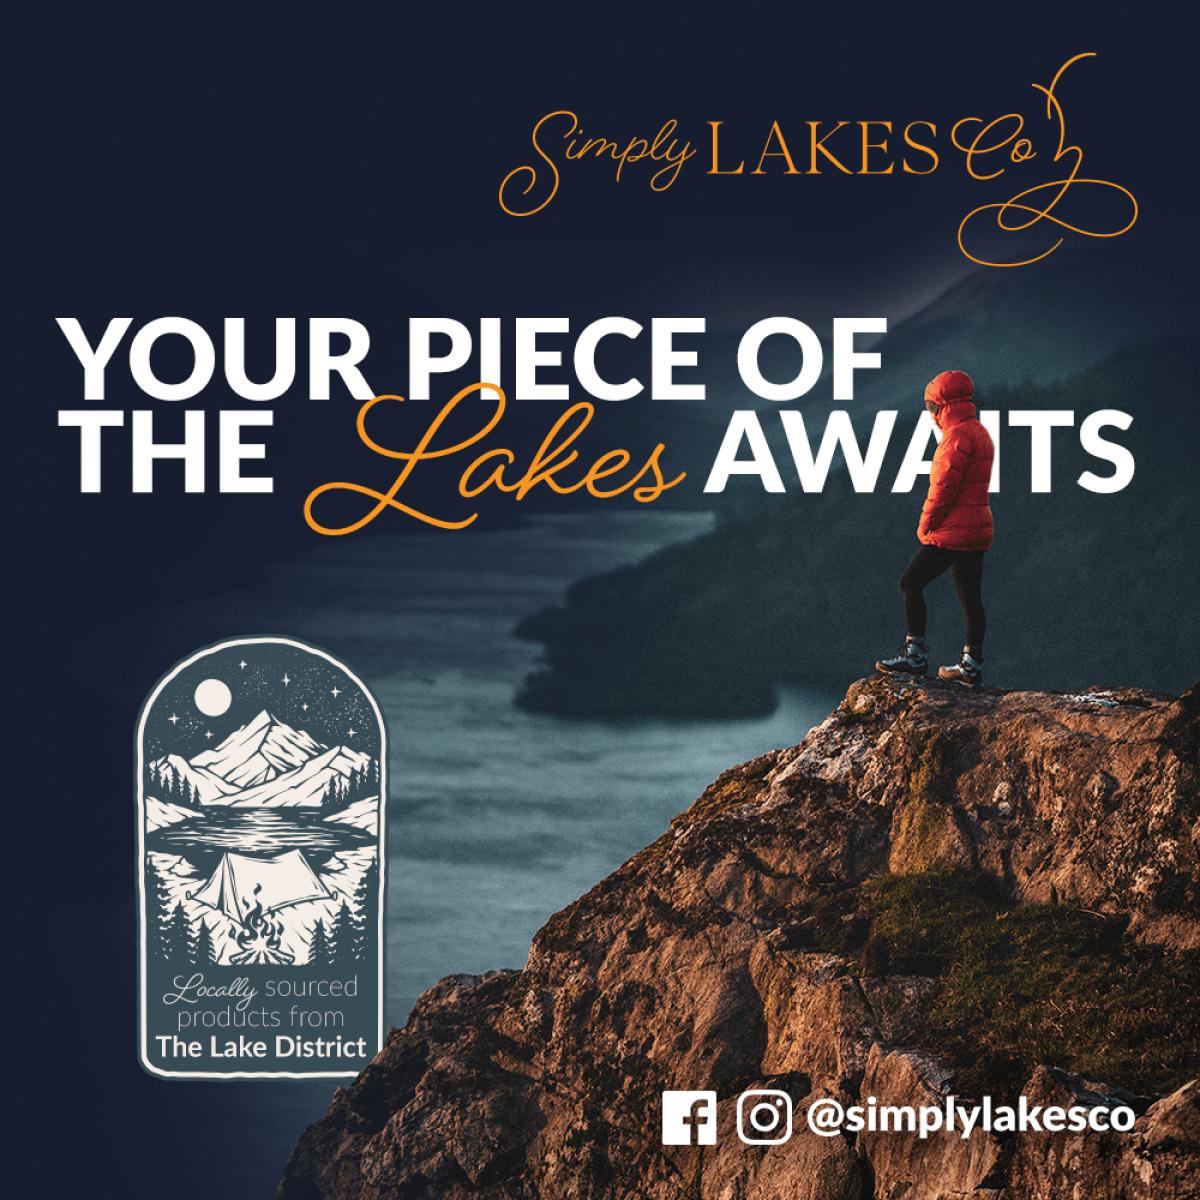 Simply Lakes Co Social Media Artwork